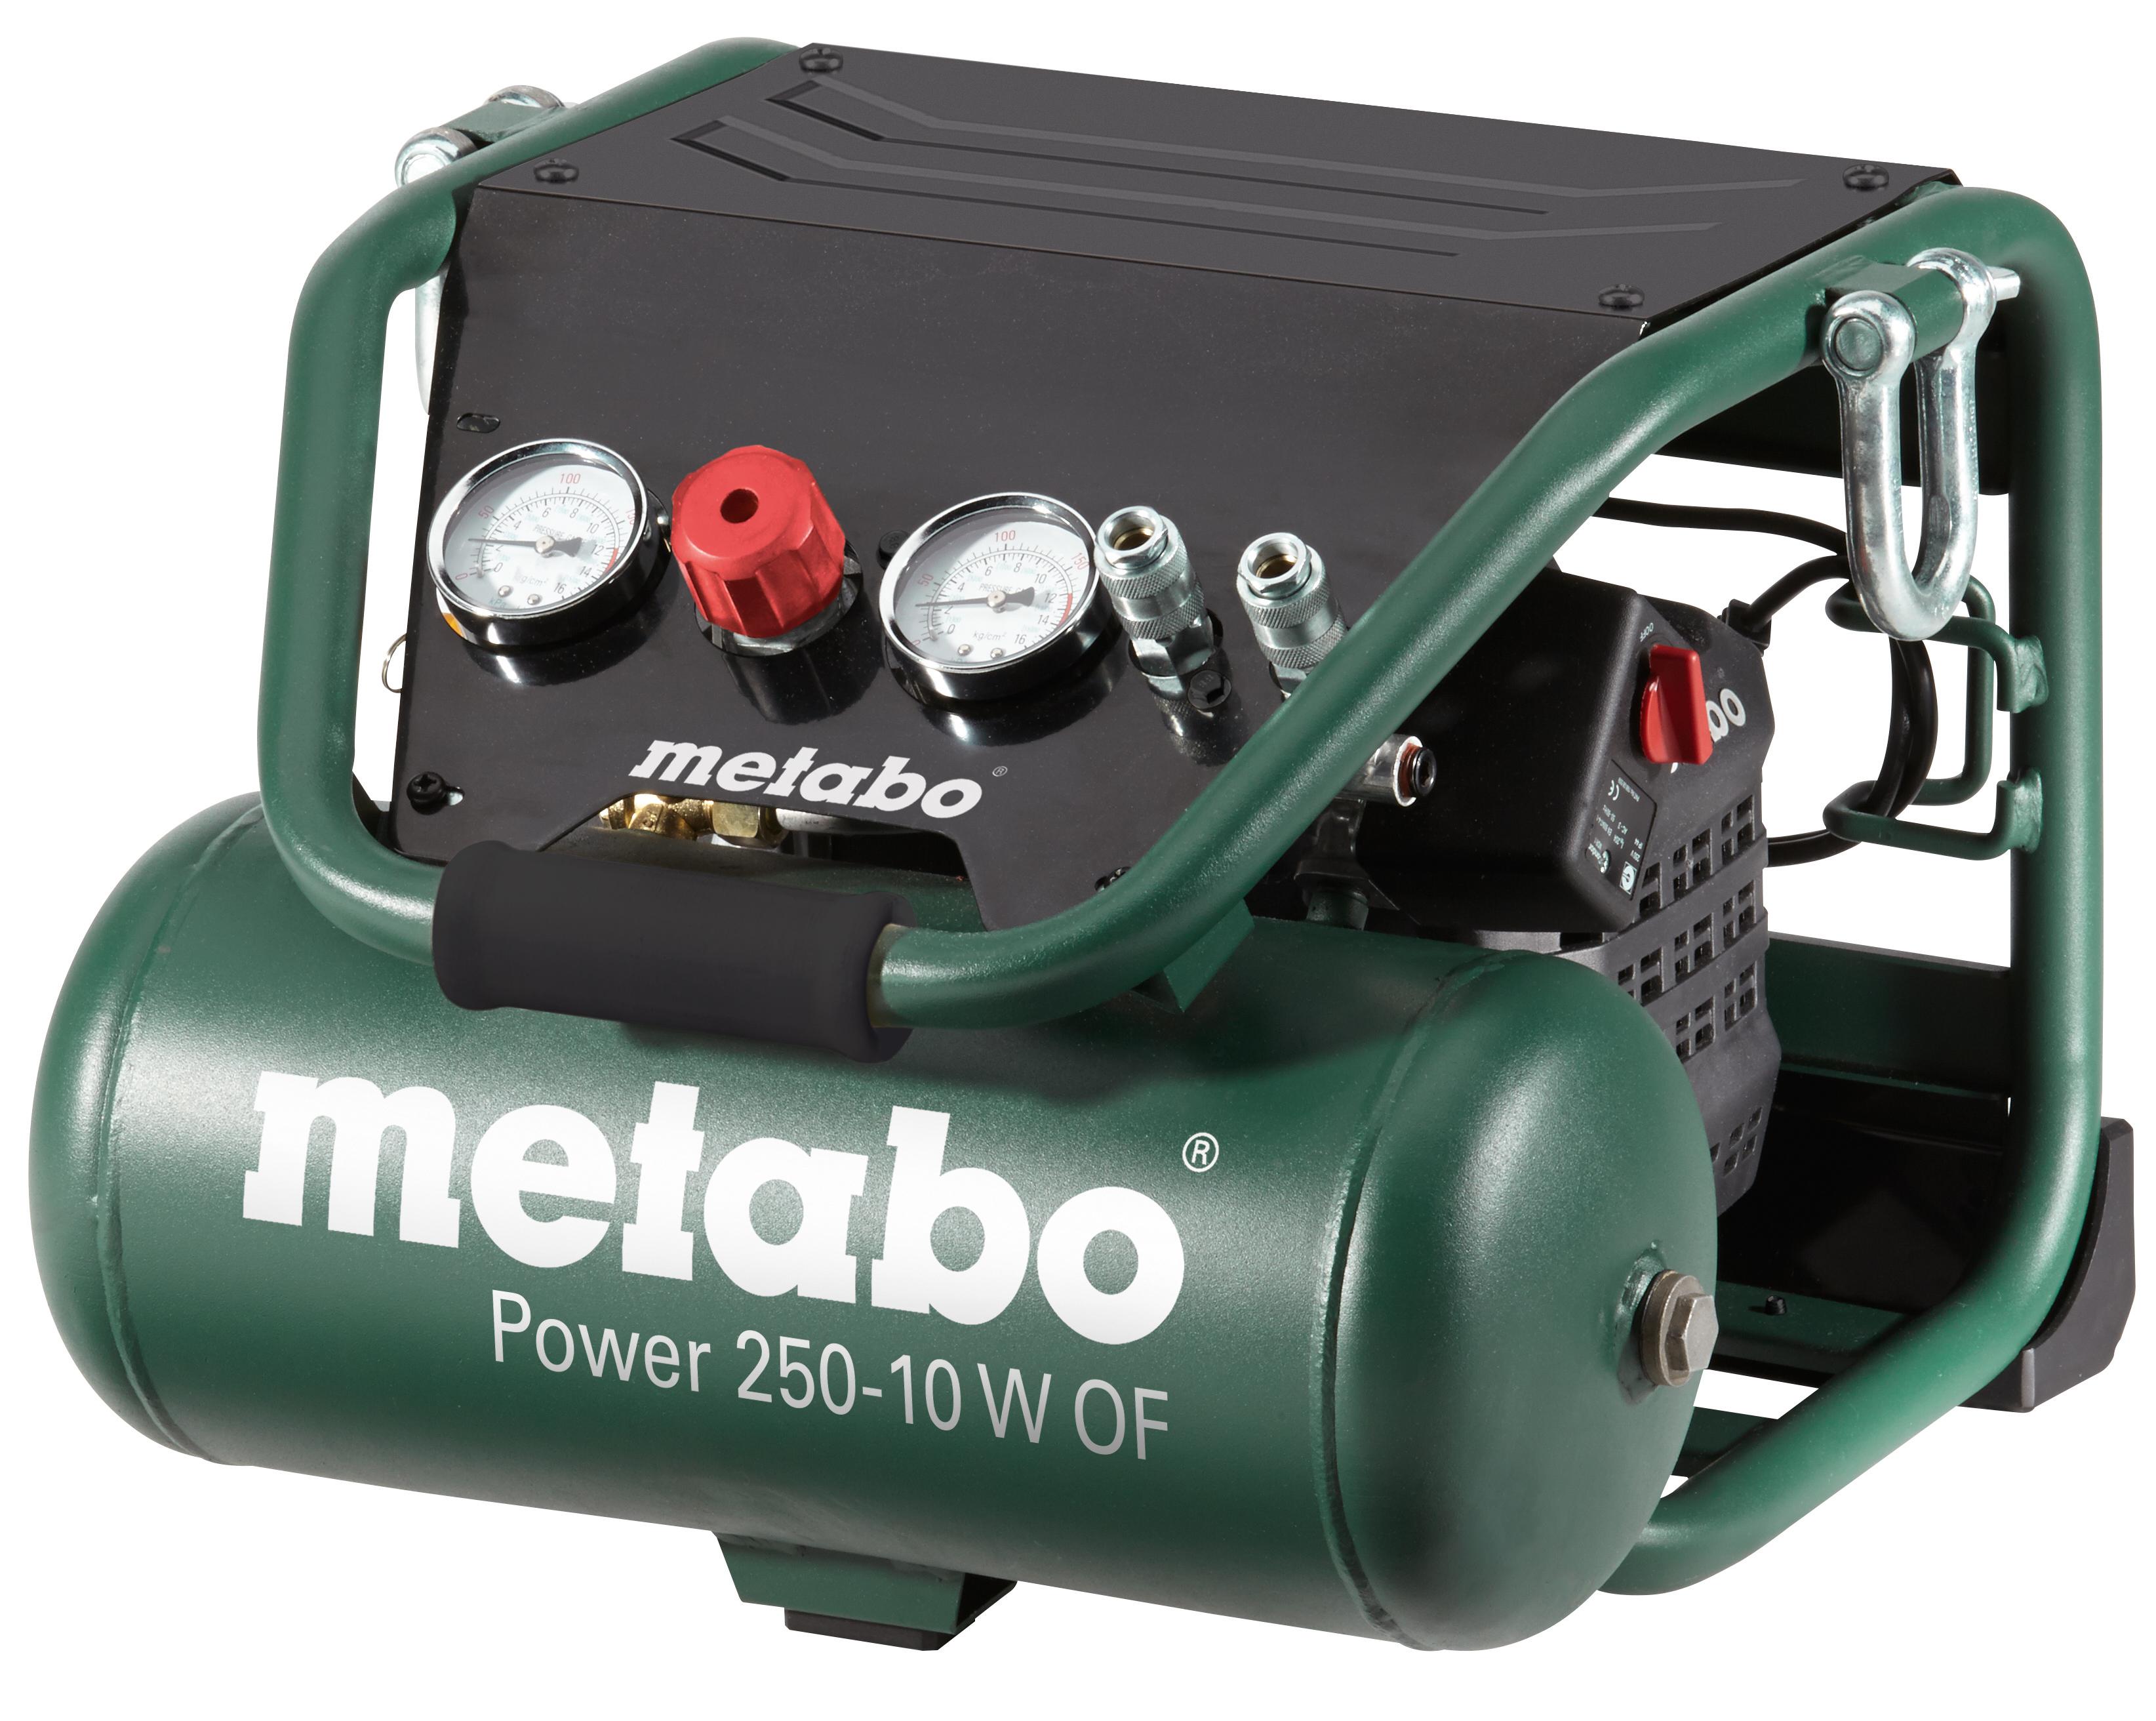 Компрессор Metabo Power 250-10 W OF  масляный компрессор metabo basic250 24w 601533000